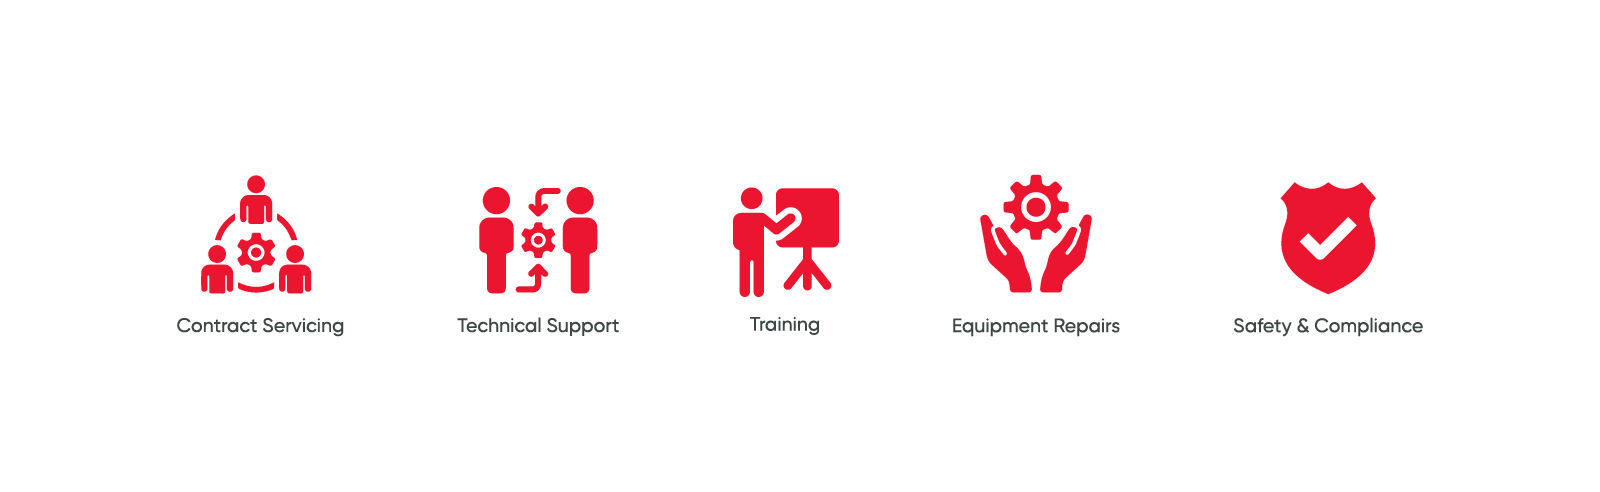 logo-design-studio-branding-brand-graphic-design-logo-service-industry-care-home-social-care